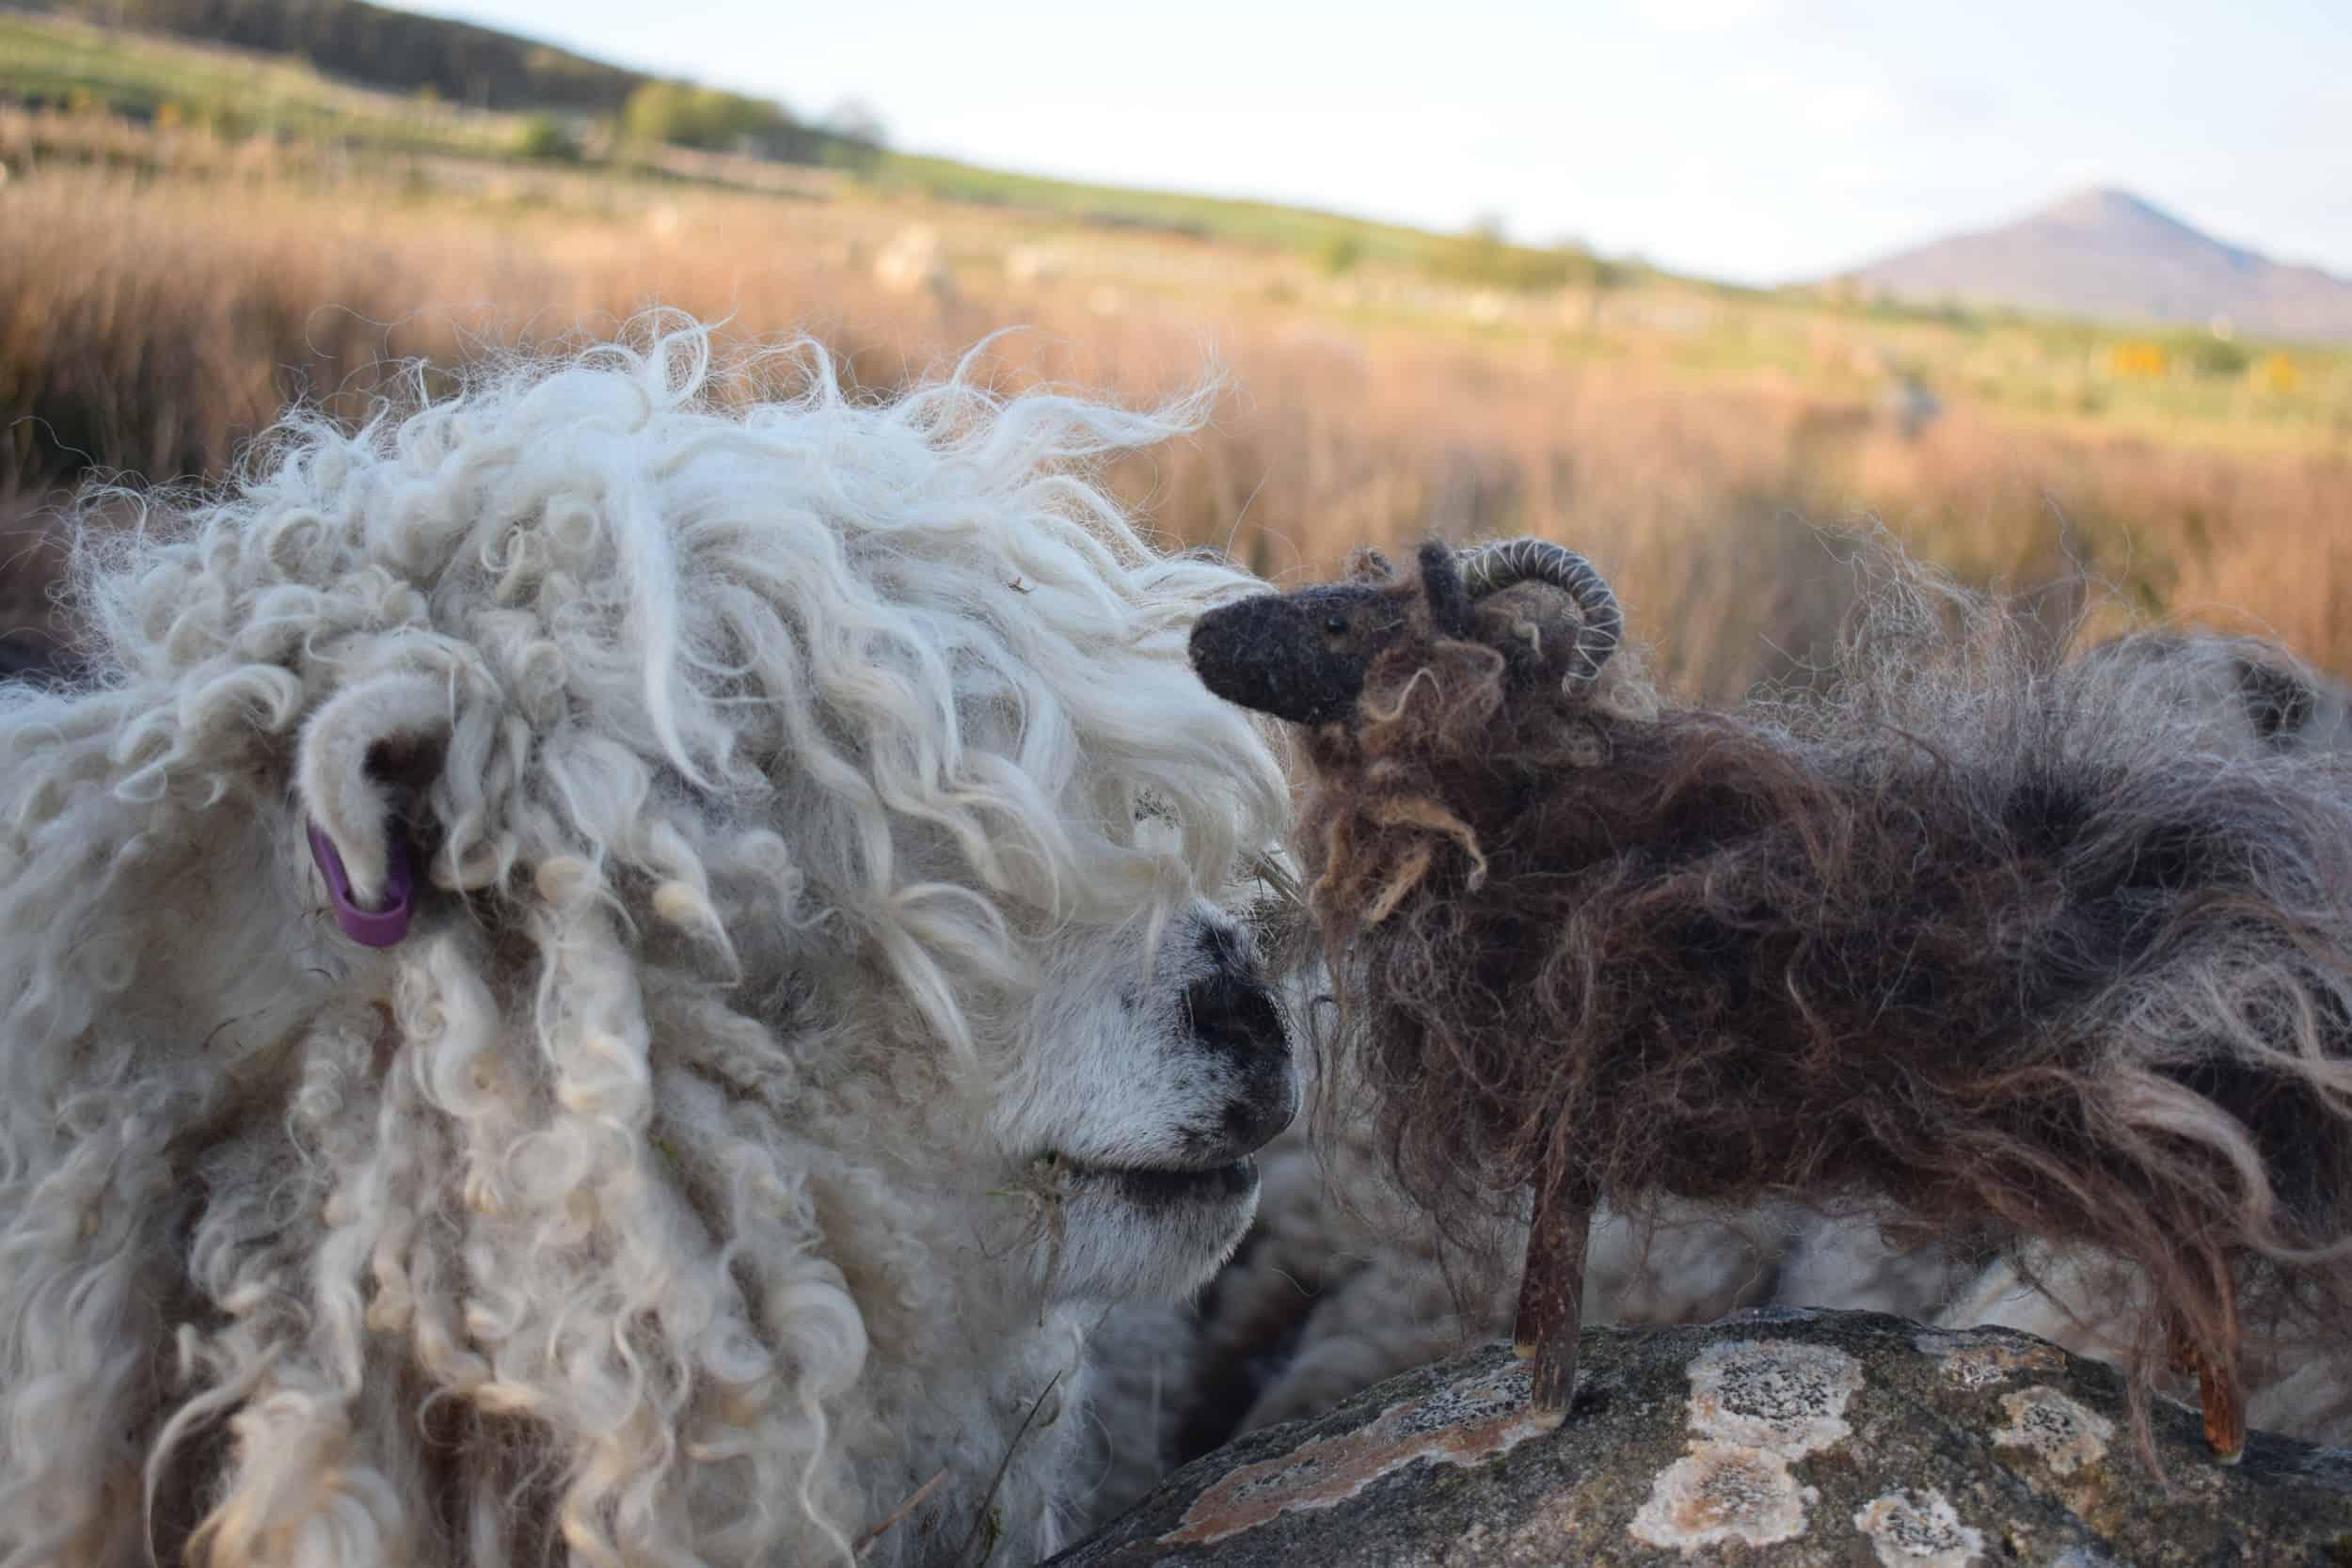 merry greyface dartmoor sheep needle felte sheep wool cute hairdo